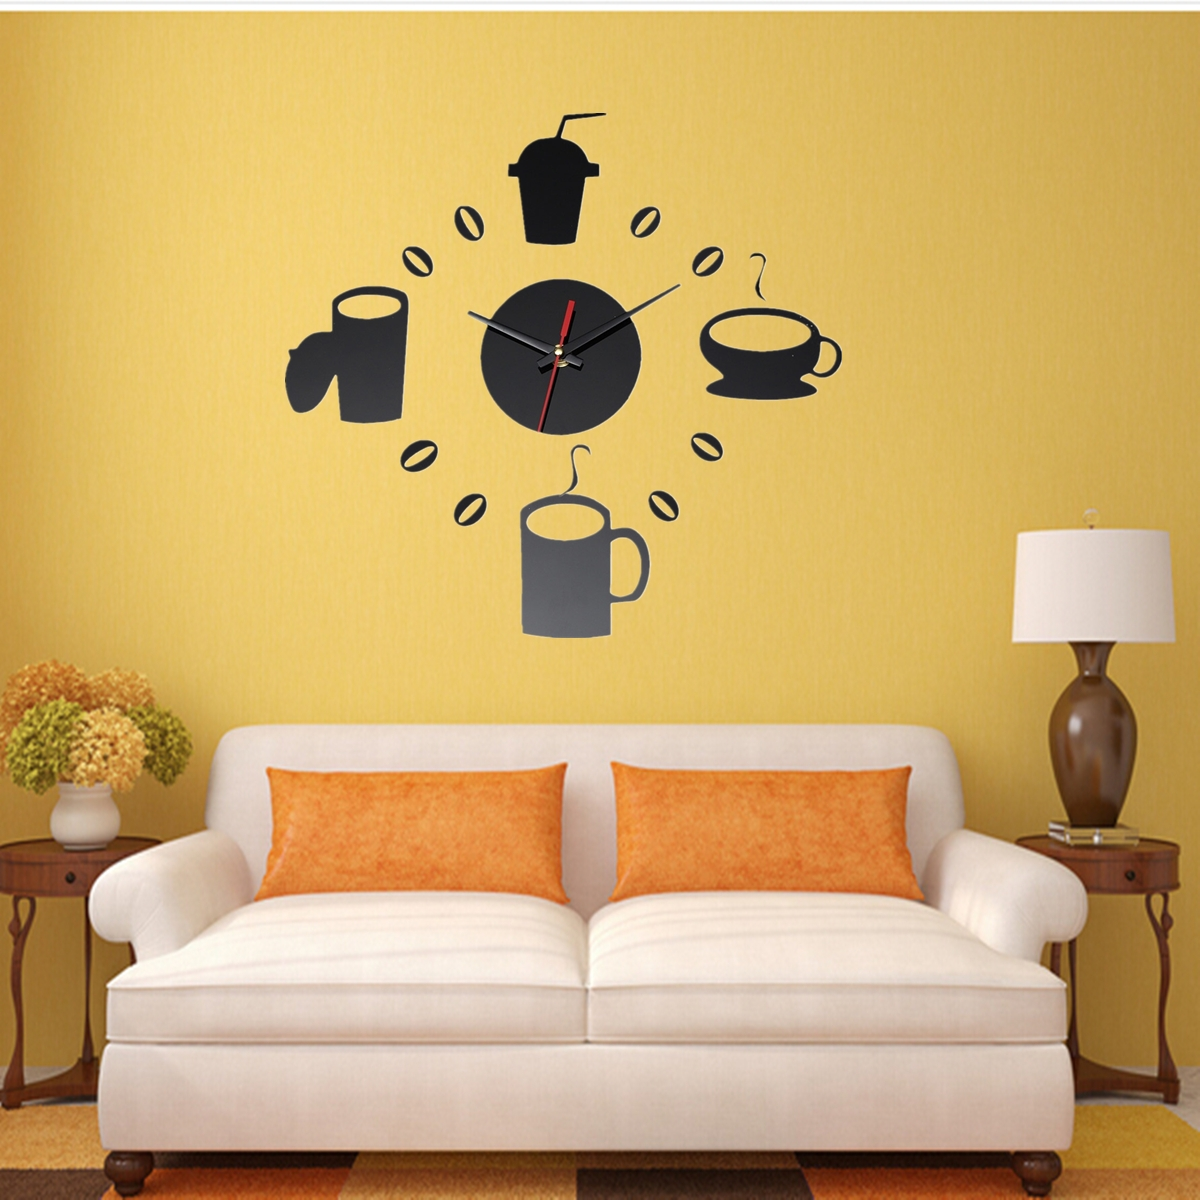 10 style trendy diy 3d horloge murale moderne pendule - Decoration salon maison ...